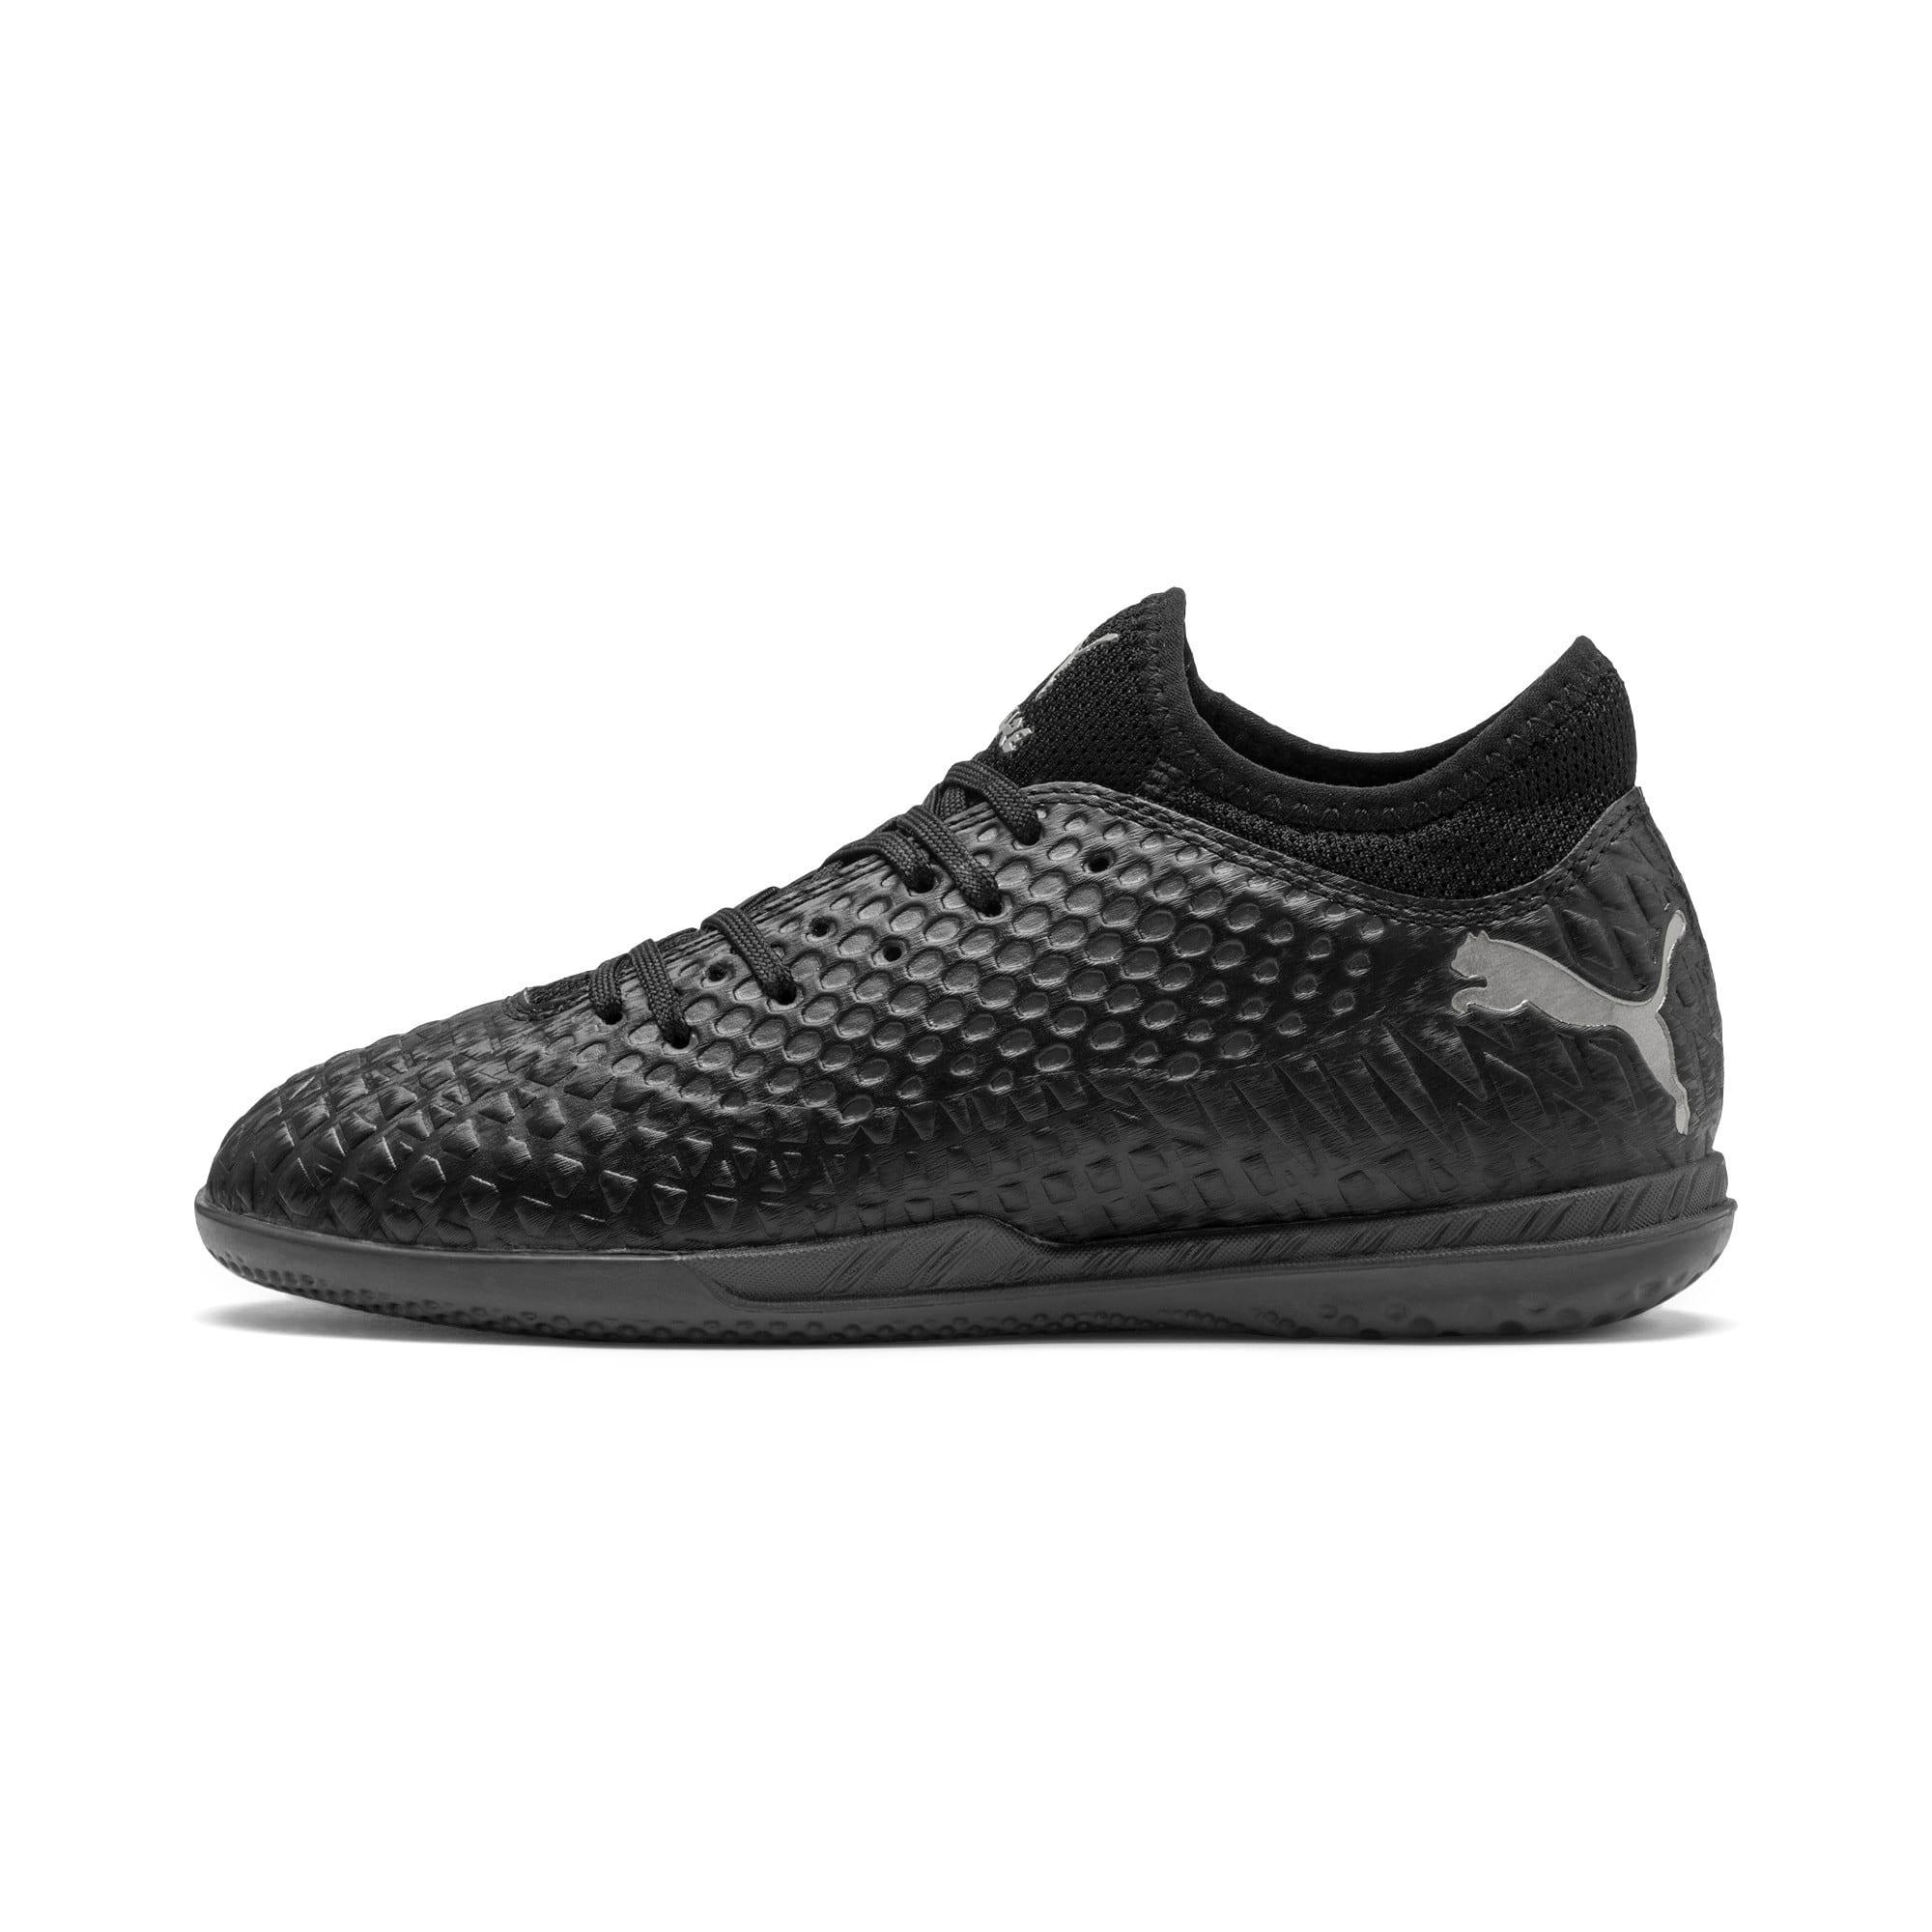 Thumbnail 1 of Chaussure de foot FUTURE 4.4 IT Youth, Black-Black-Puma Aged Silver, medium